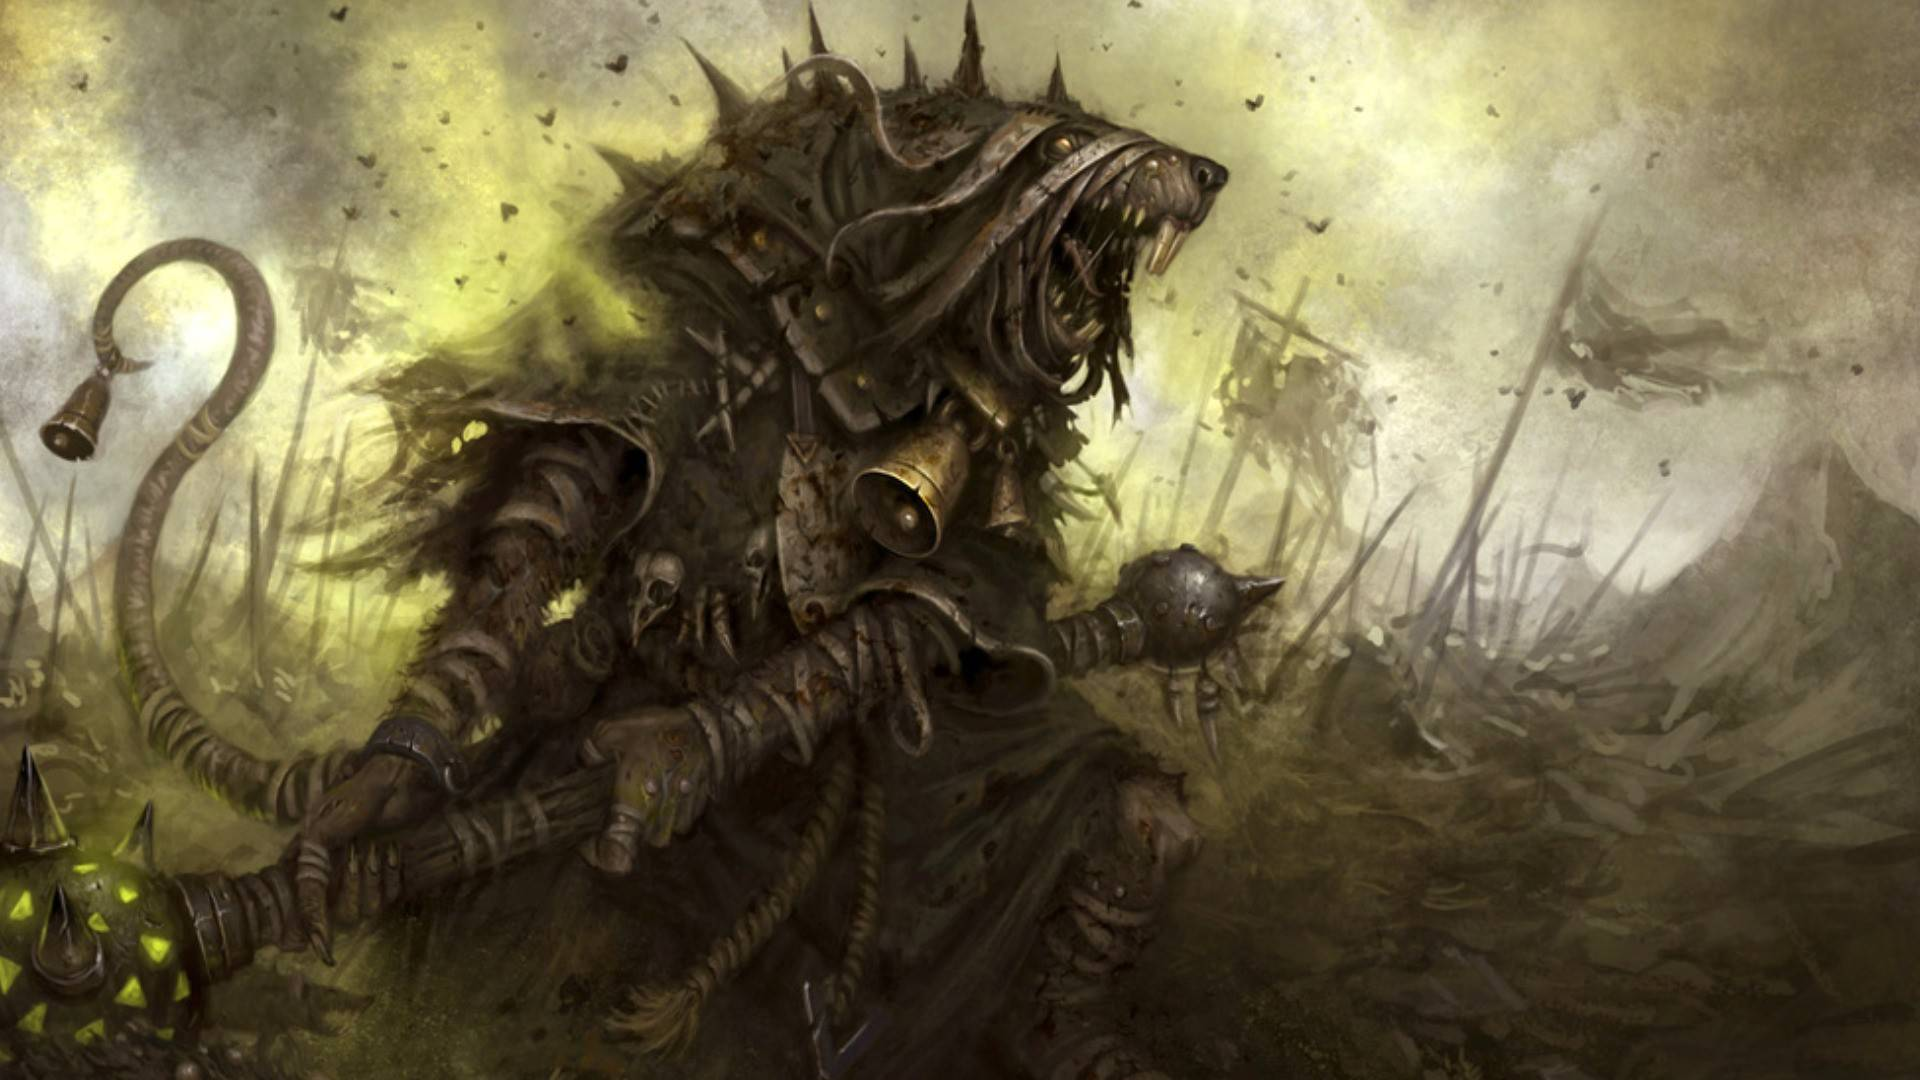 Image - Warhammer-fantasy-1920x1080-wallpaper-2368751 jpg